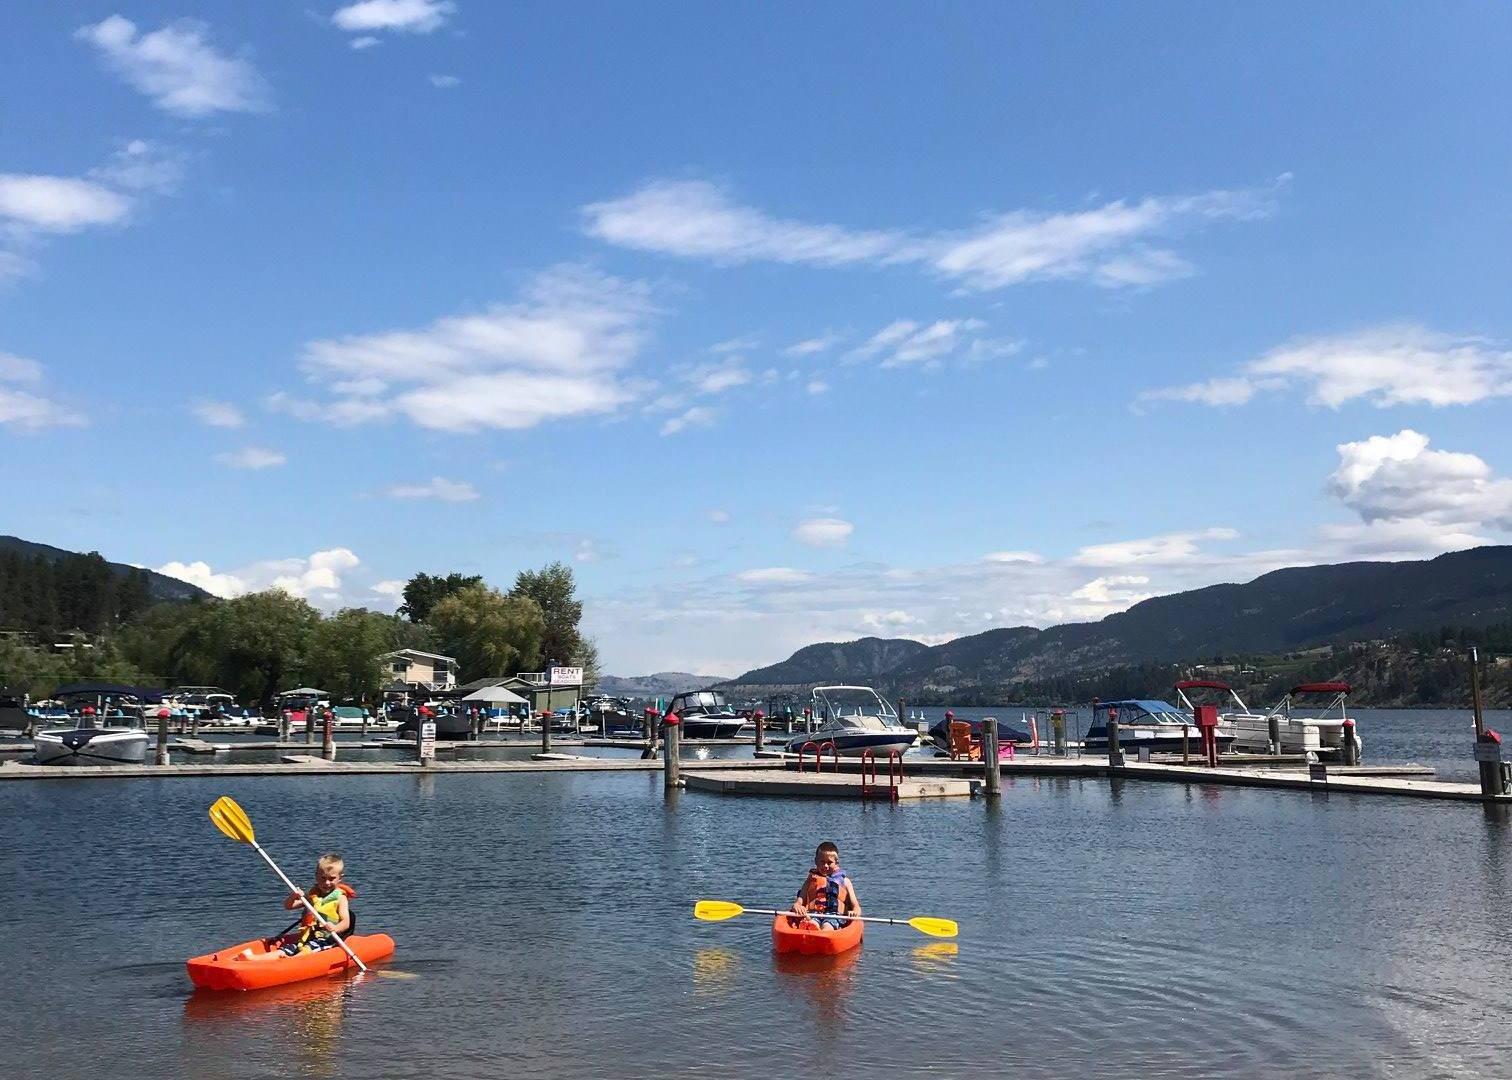 kayakers-kids_Wood-Lake-RV-Park-bc.jpg